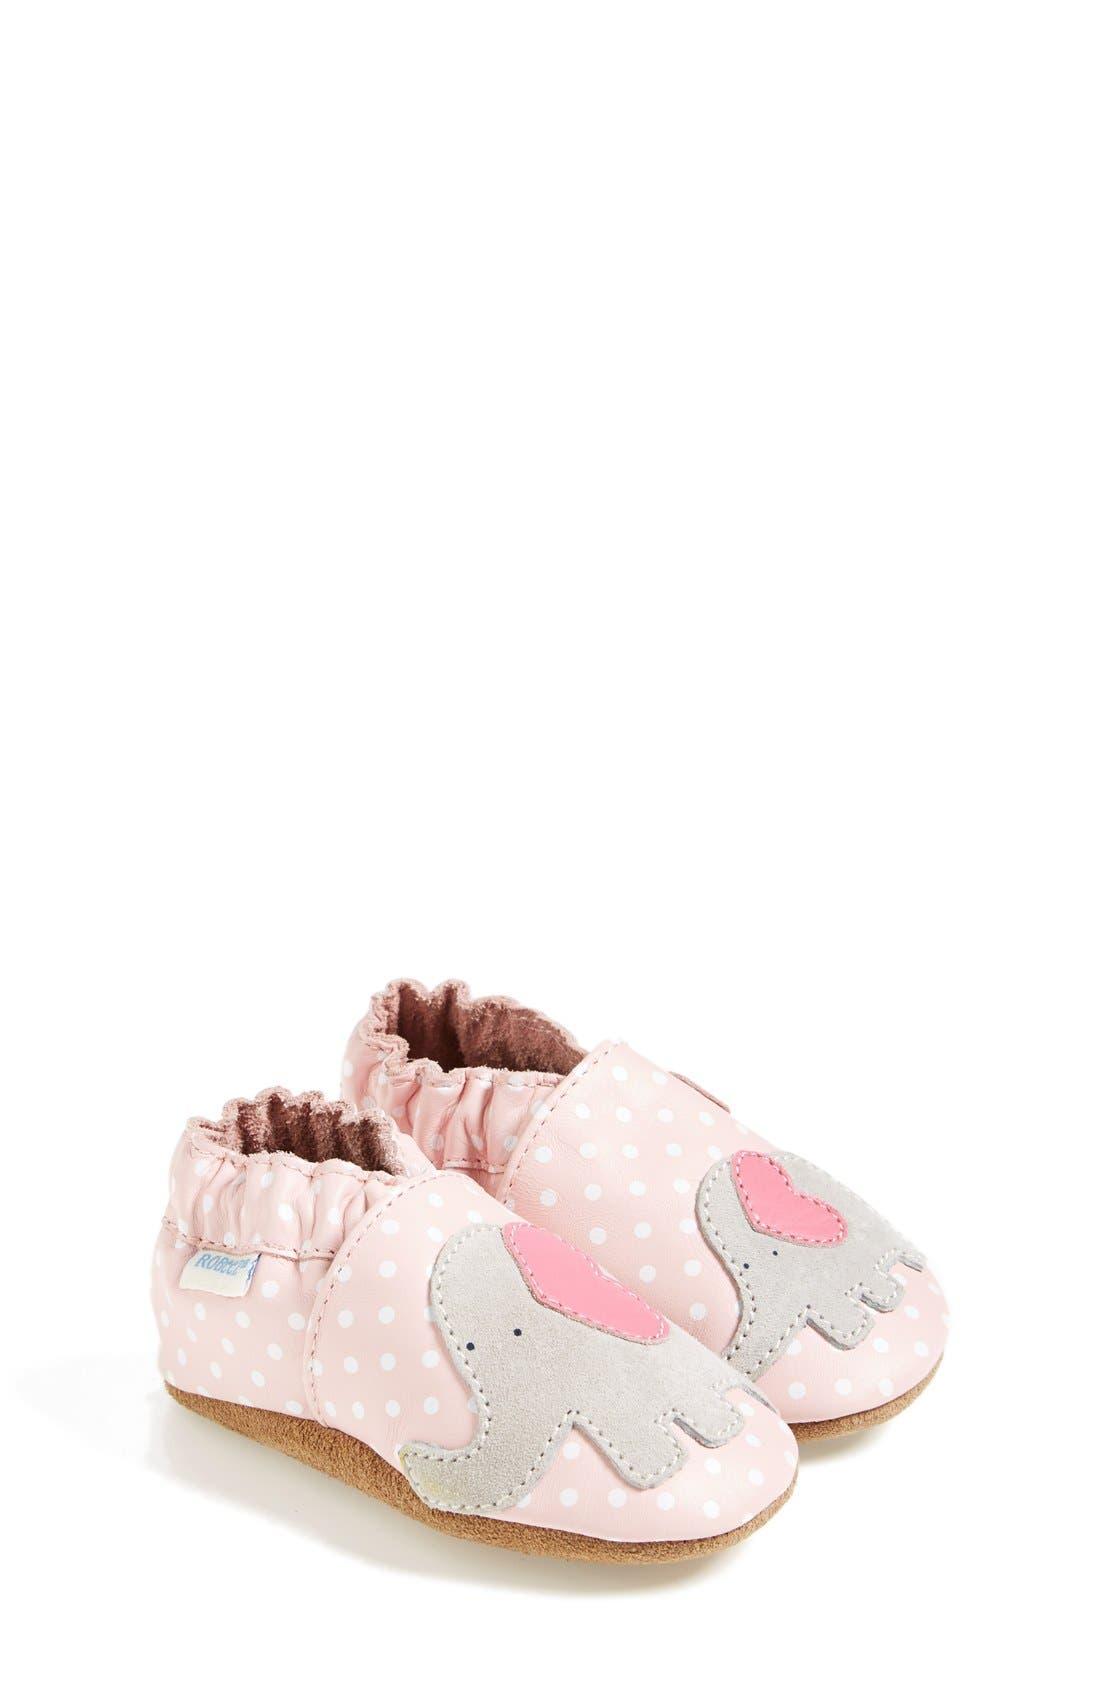 'Little Peanut' Crib Shoe,                             Main thumbnail 1, color,                             PASTEL PINK